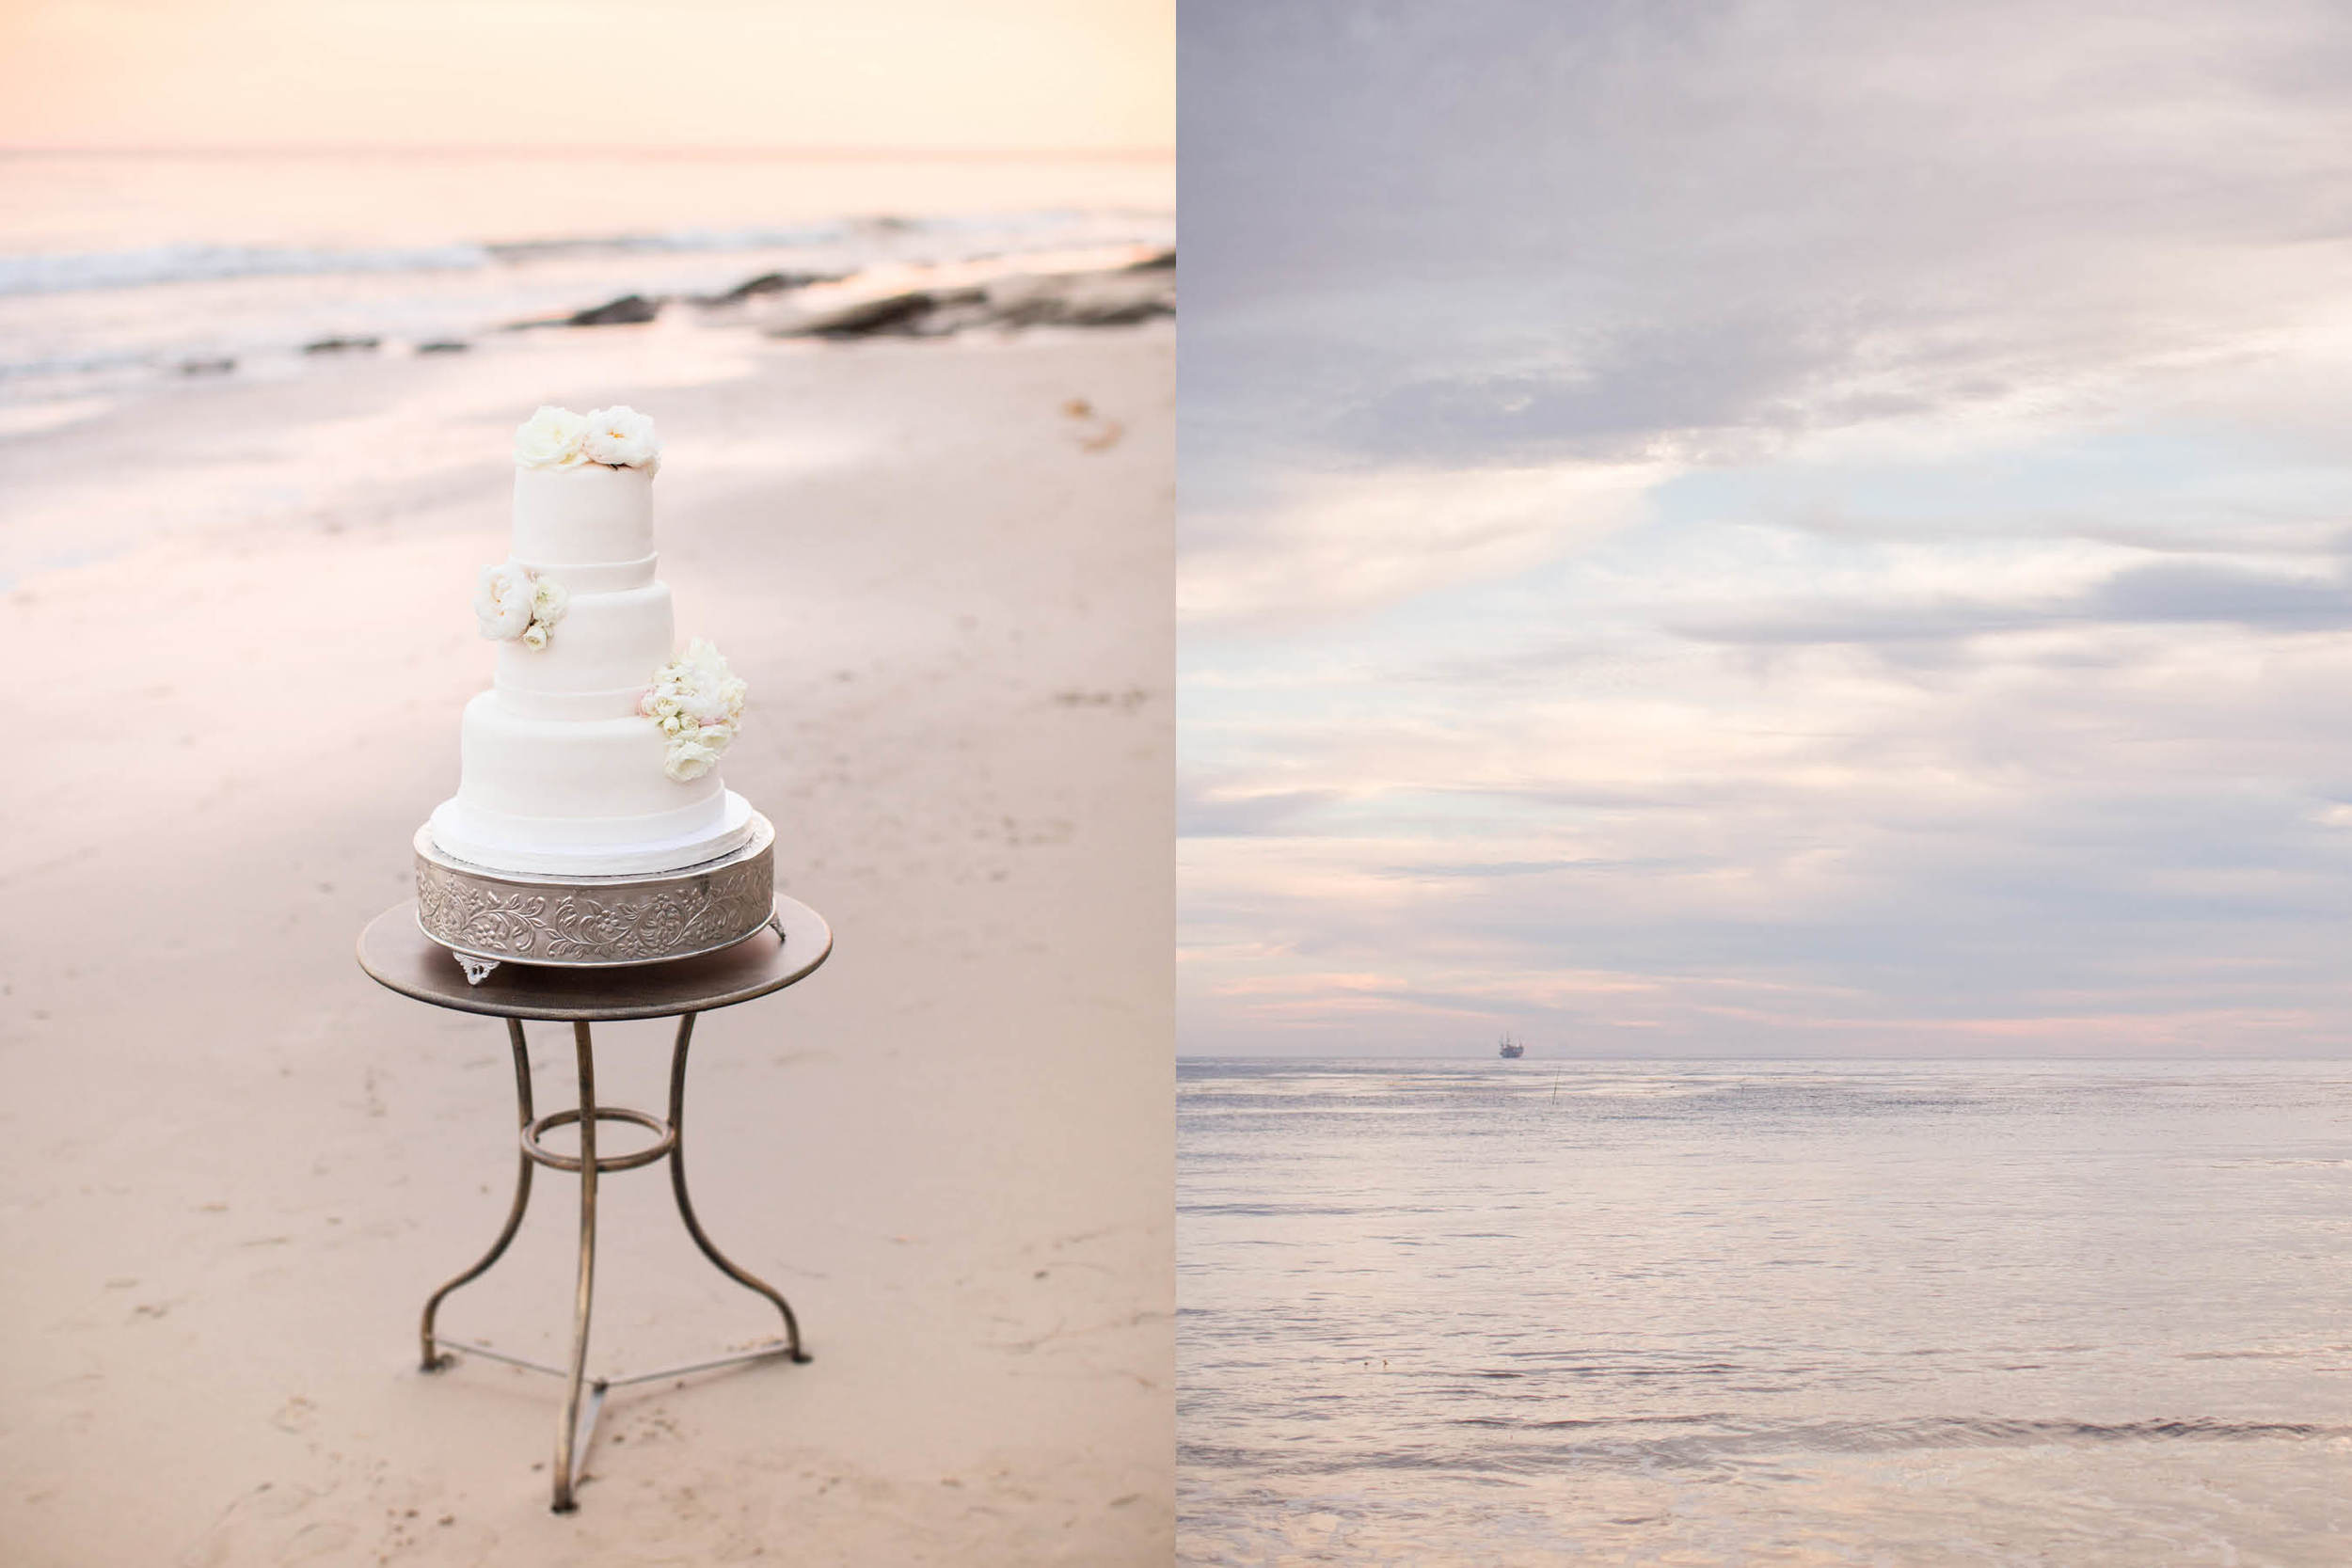 santa-barbara-elopement-wedding-beach-front-private-estate-rustic-ocean-view-nautical-lantern-white-horse-alegria-by-design (22).jpg